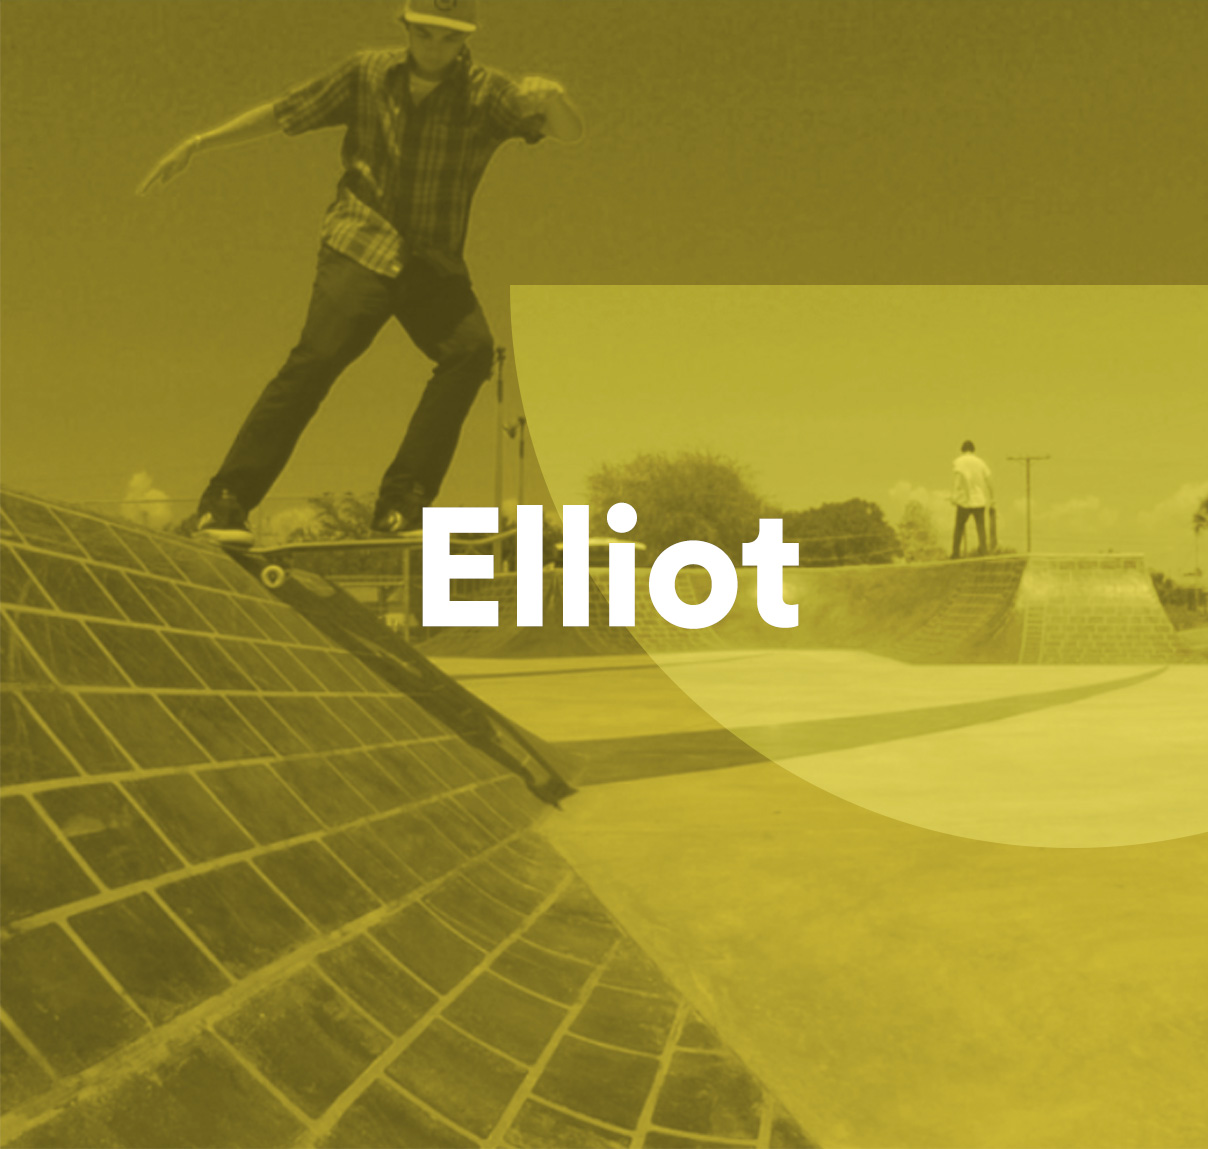 projects_thumbs_elliot.jpg